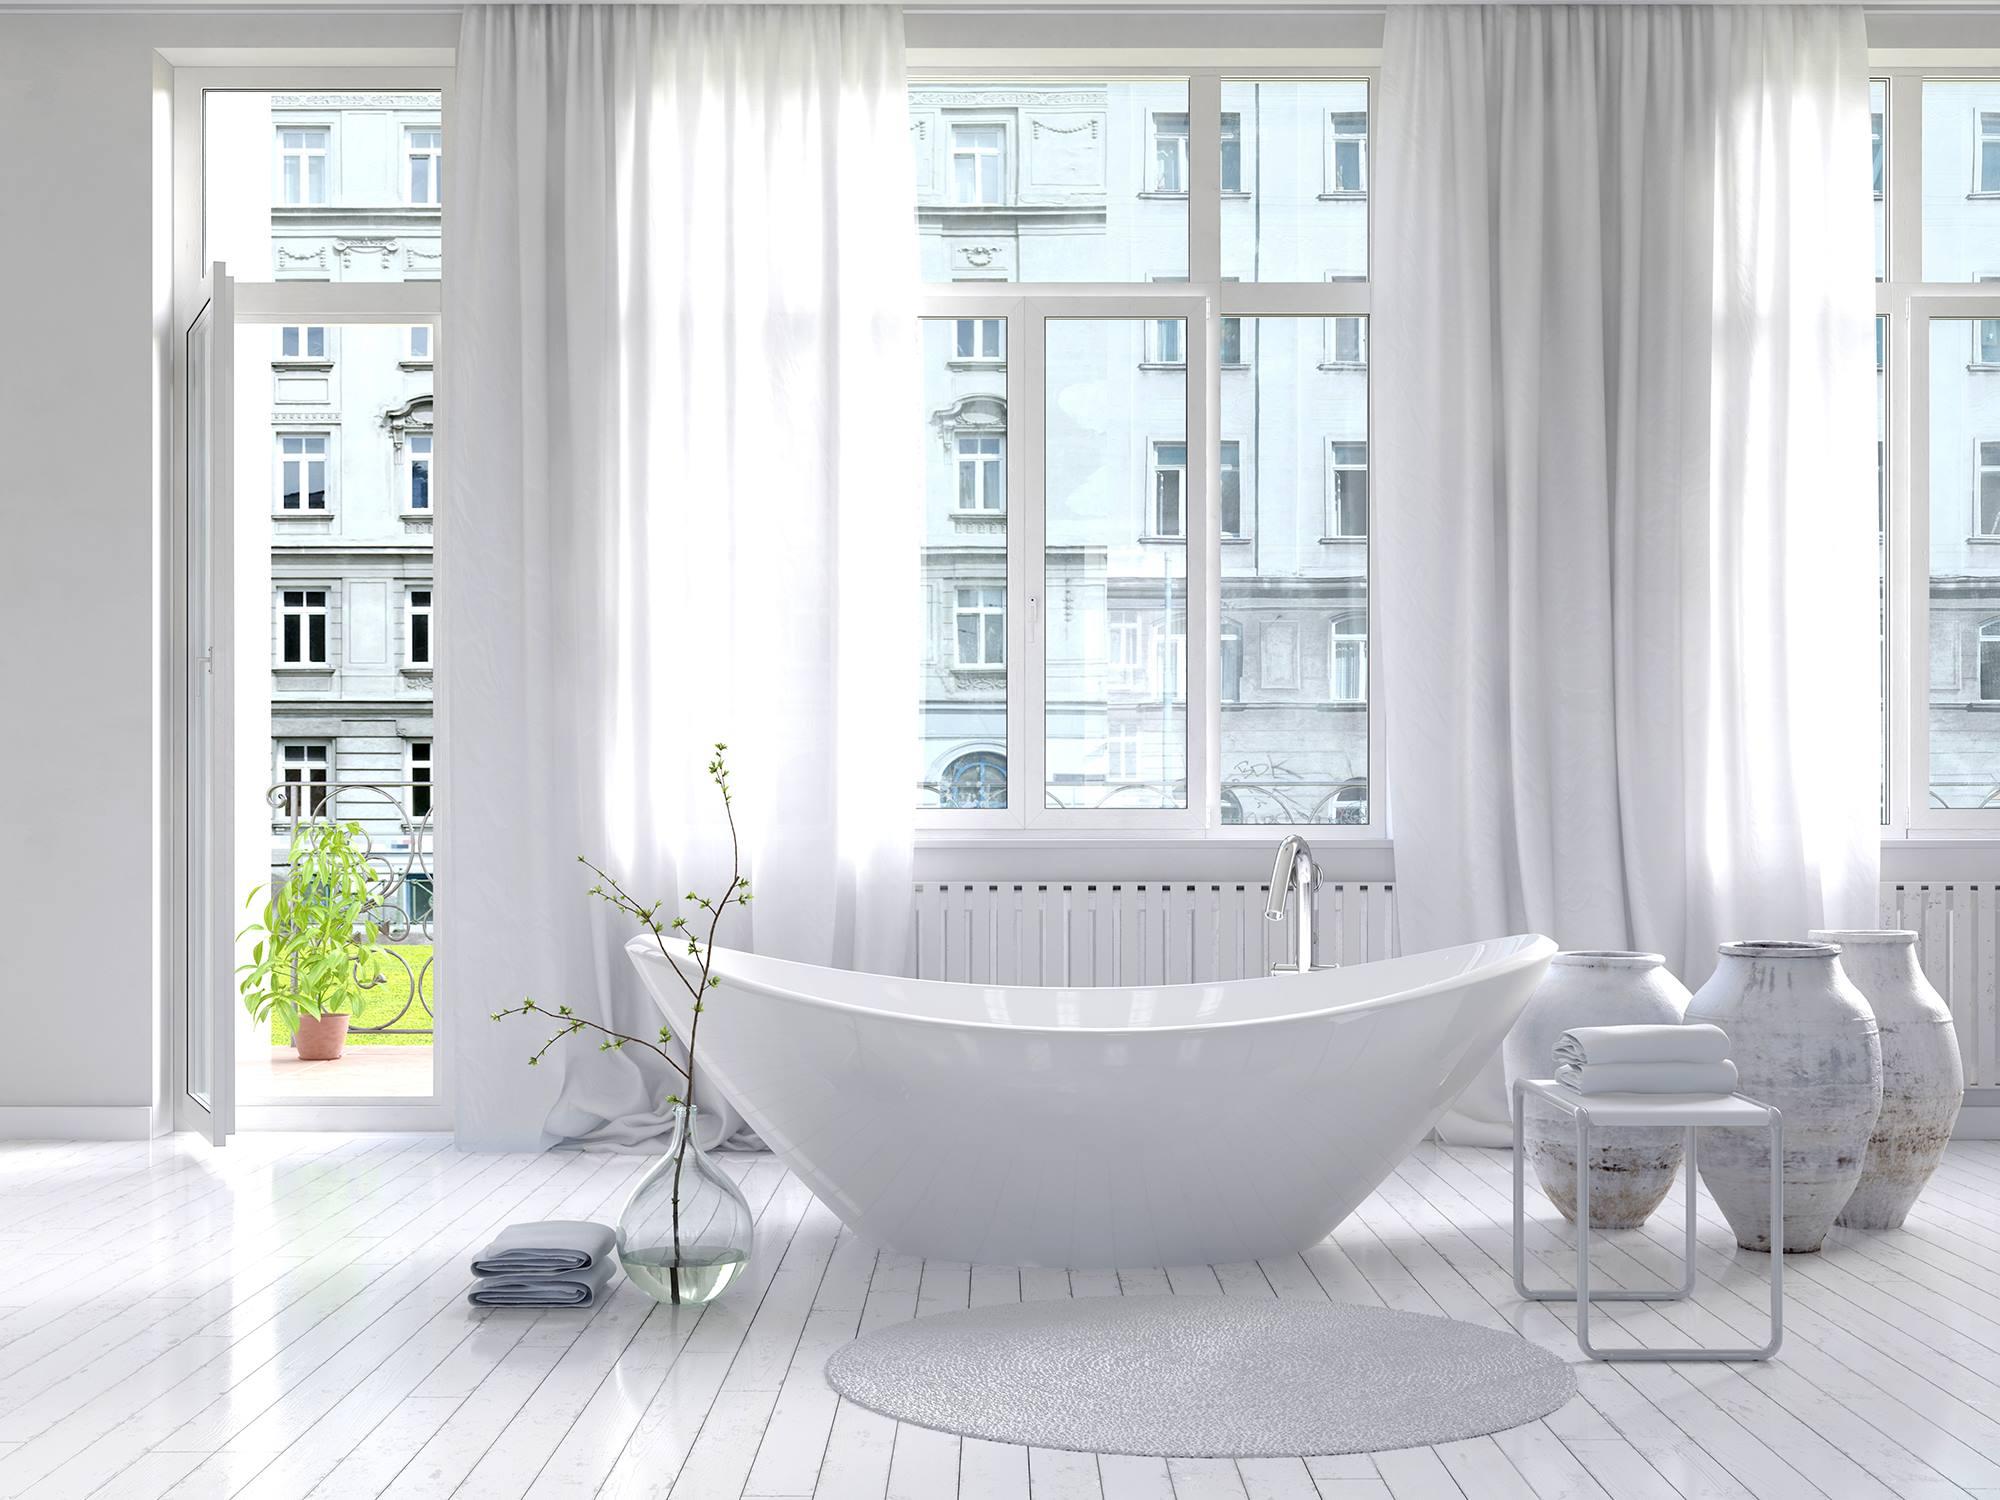 Revitalize Your Bathroom With a Al\'s Bathtub Refinishing - Al\'s ...